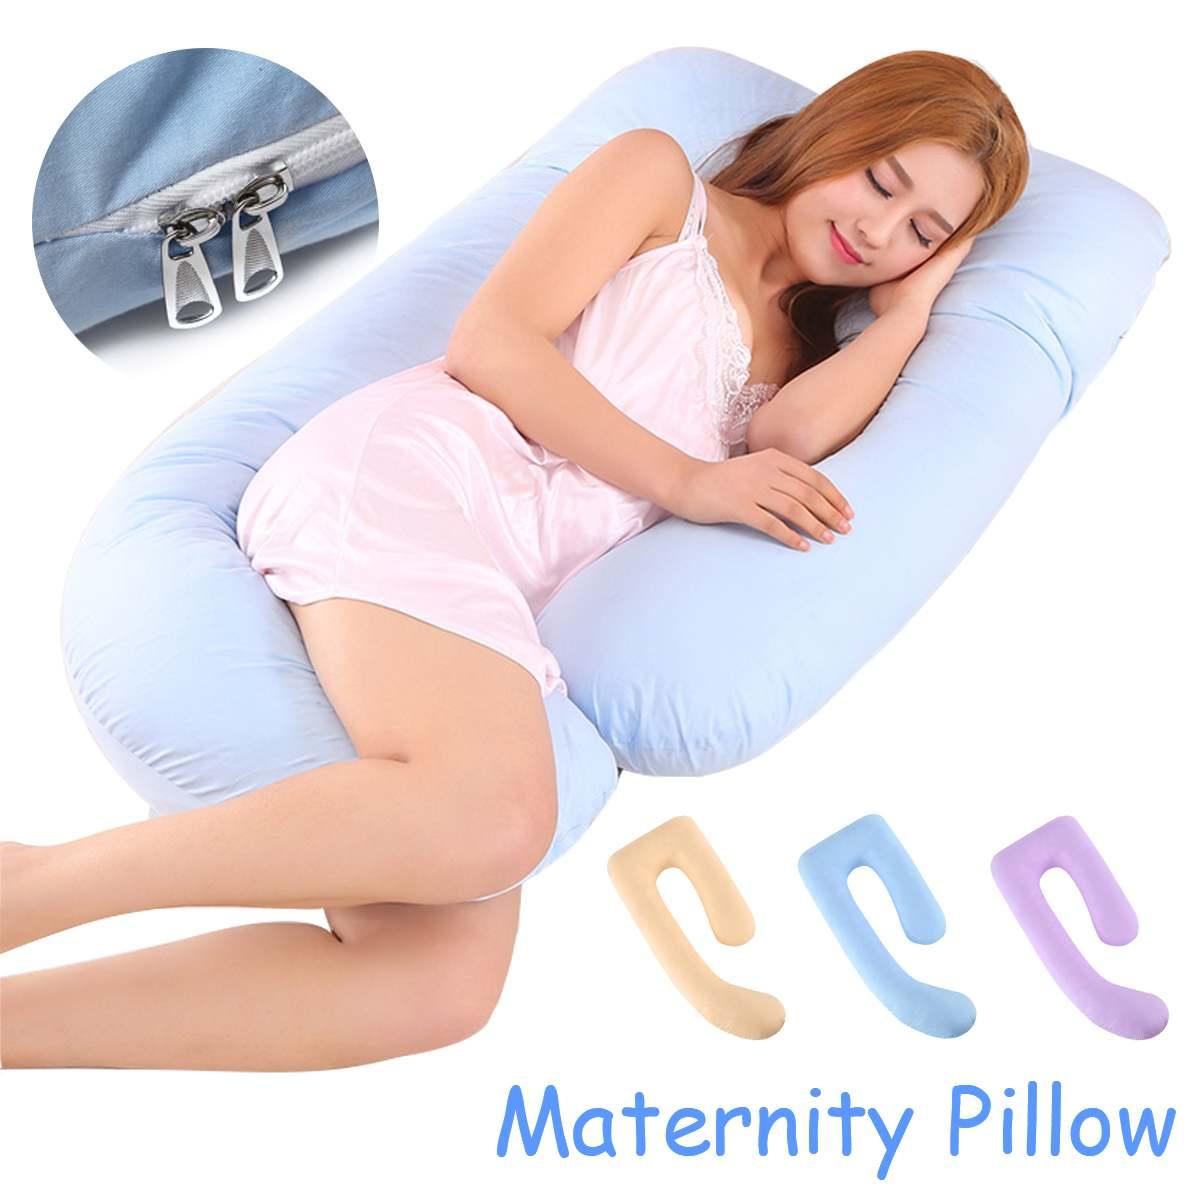 40x30x18 سنتيمتر U-شكل وسادة حمل كبيرة مريحة حزام الأمهات المرضعات الجسم وسادة حمل النساء الحوامل الجانب النائم وسادة